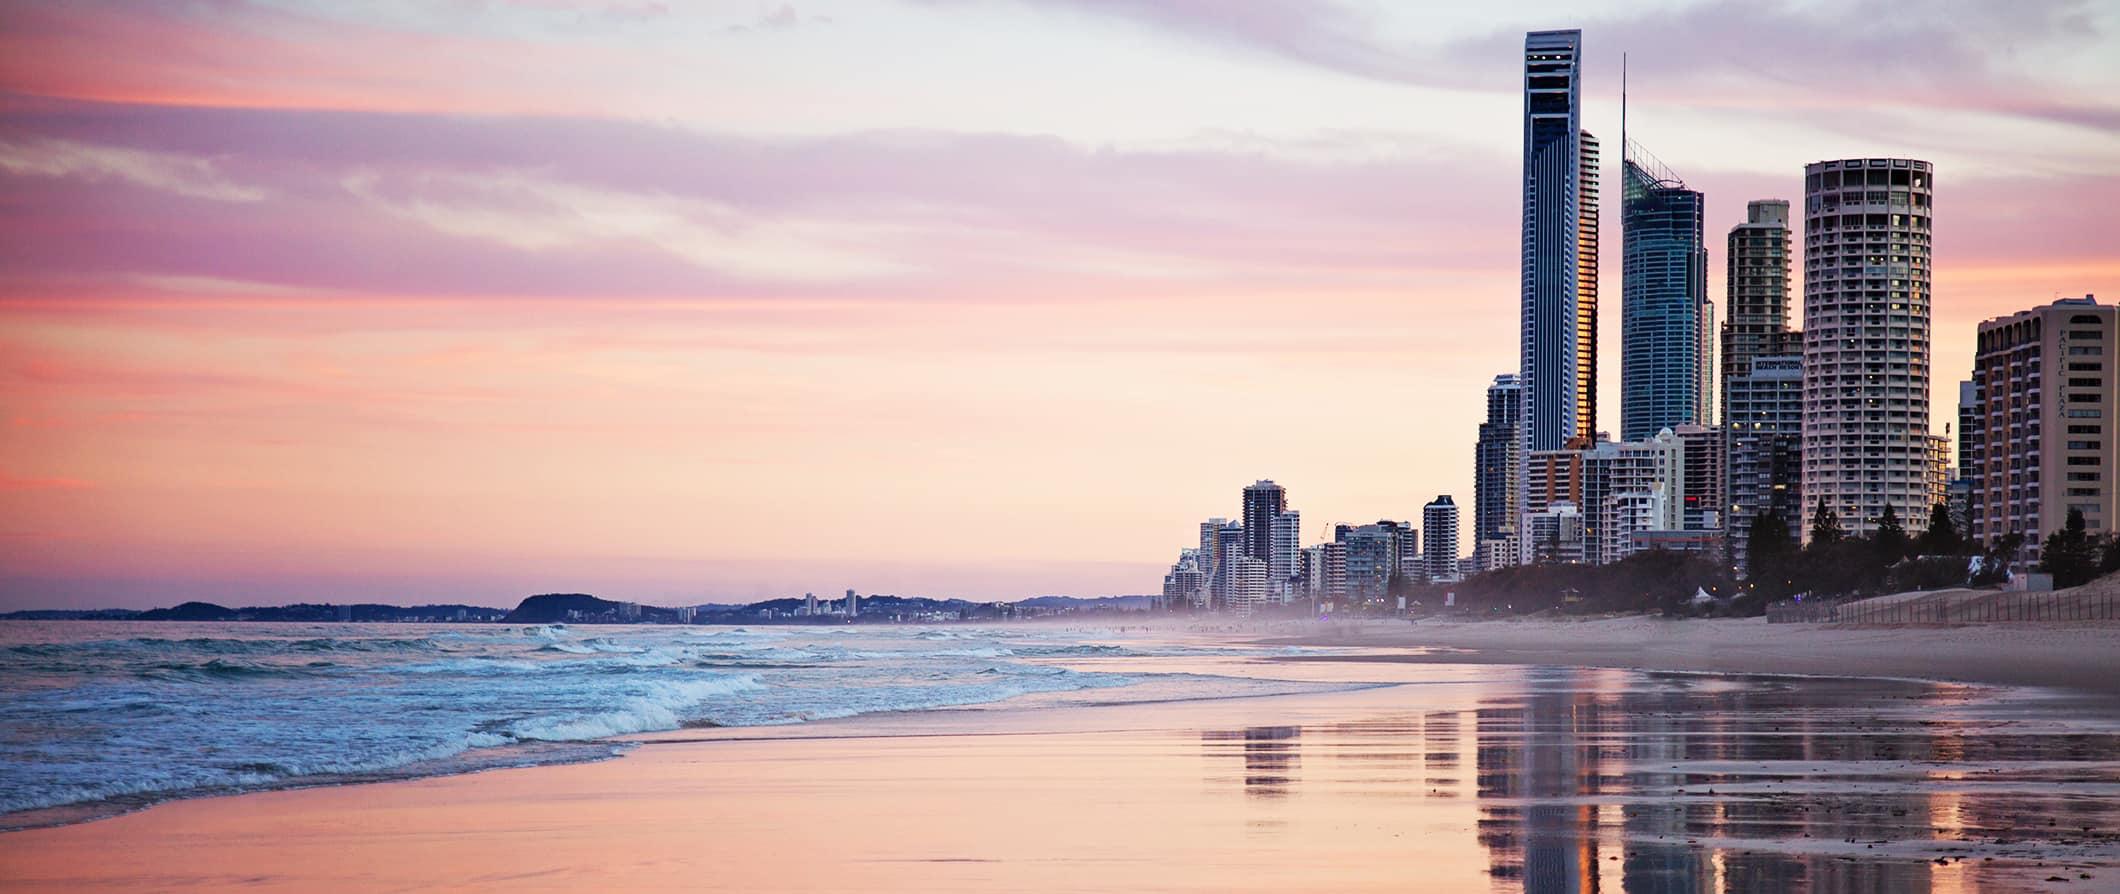 australia city and beach at sunset